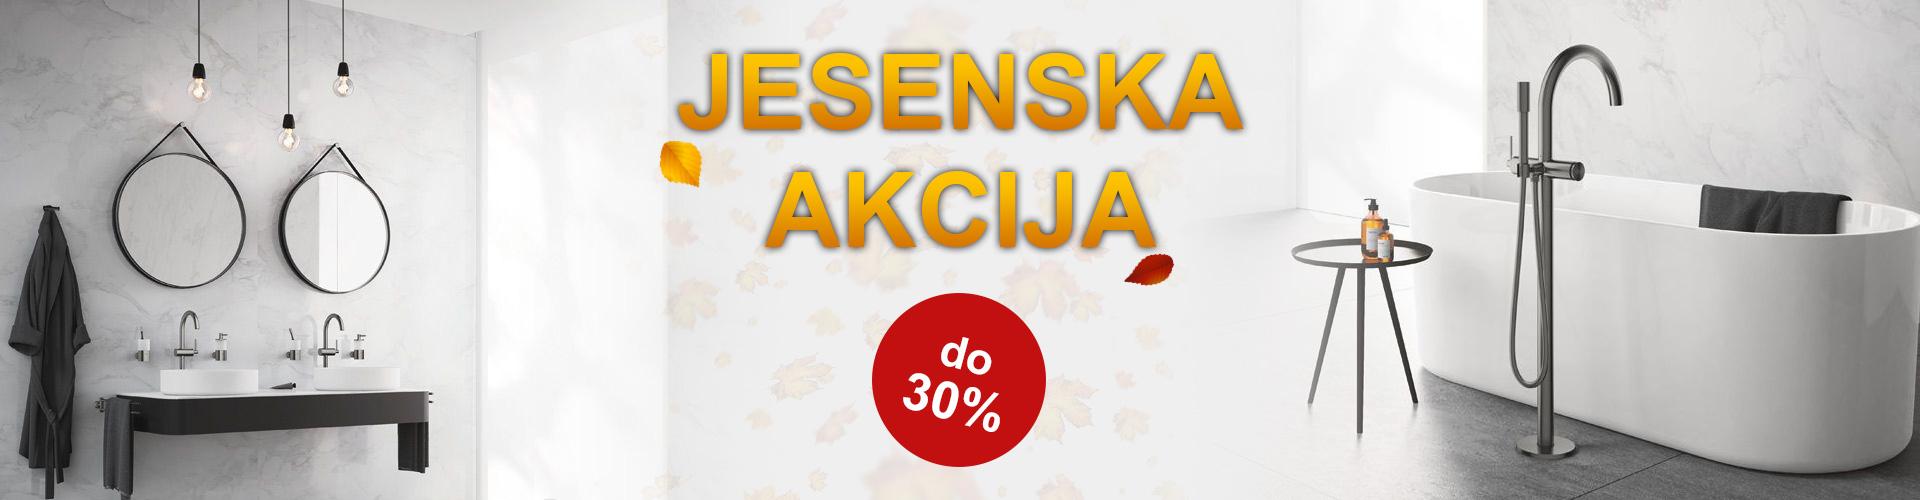 https://www.kimicommerce.hr/Repository/Banners/largeBanners-jesenska-akcija-102019.jpg